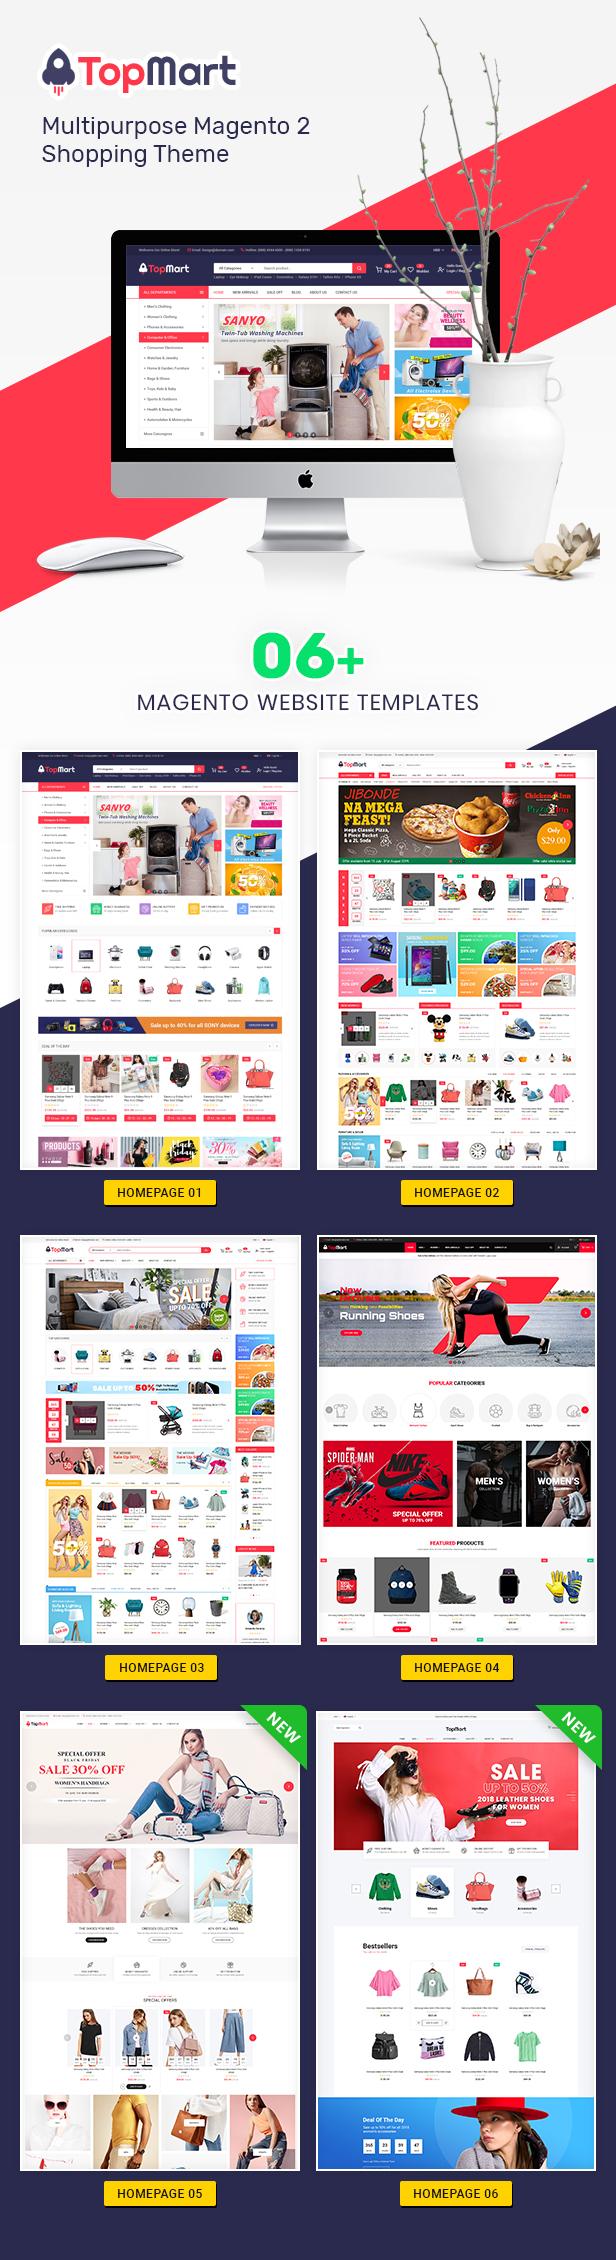 TopMart - MultiPurpose Responsive Magento 2 Shopping Theme - 2